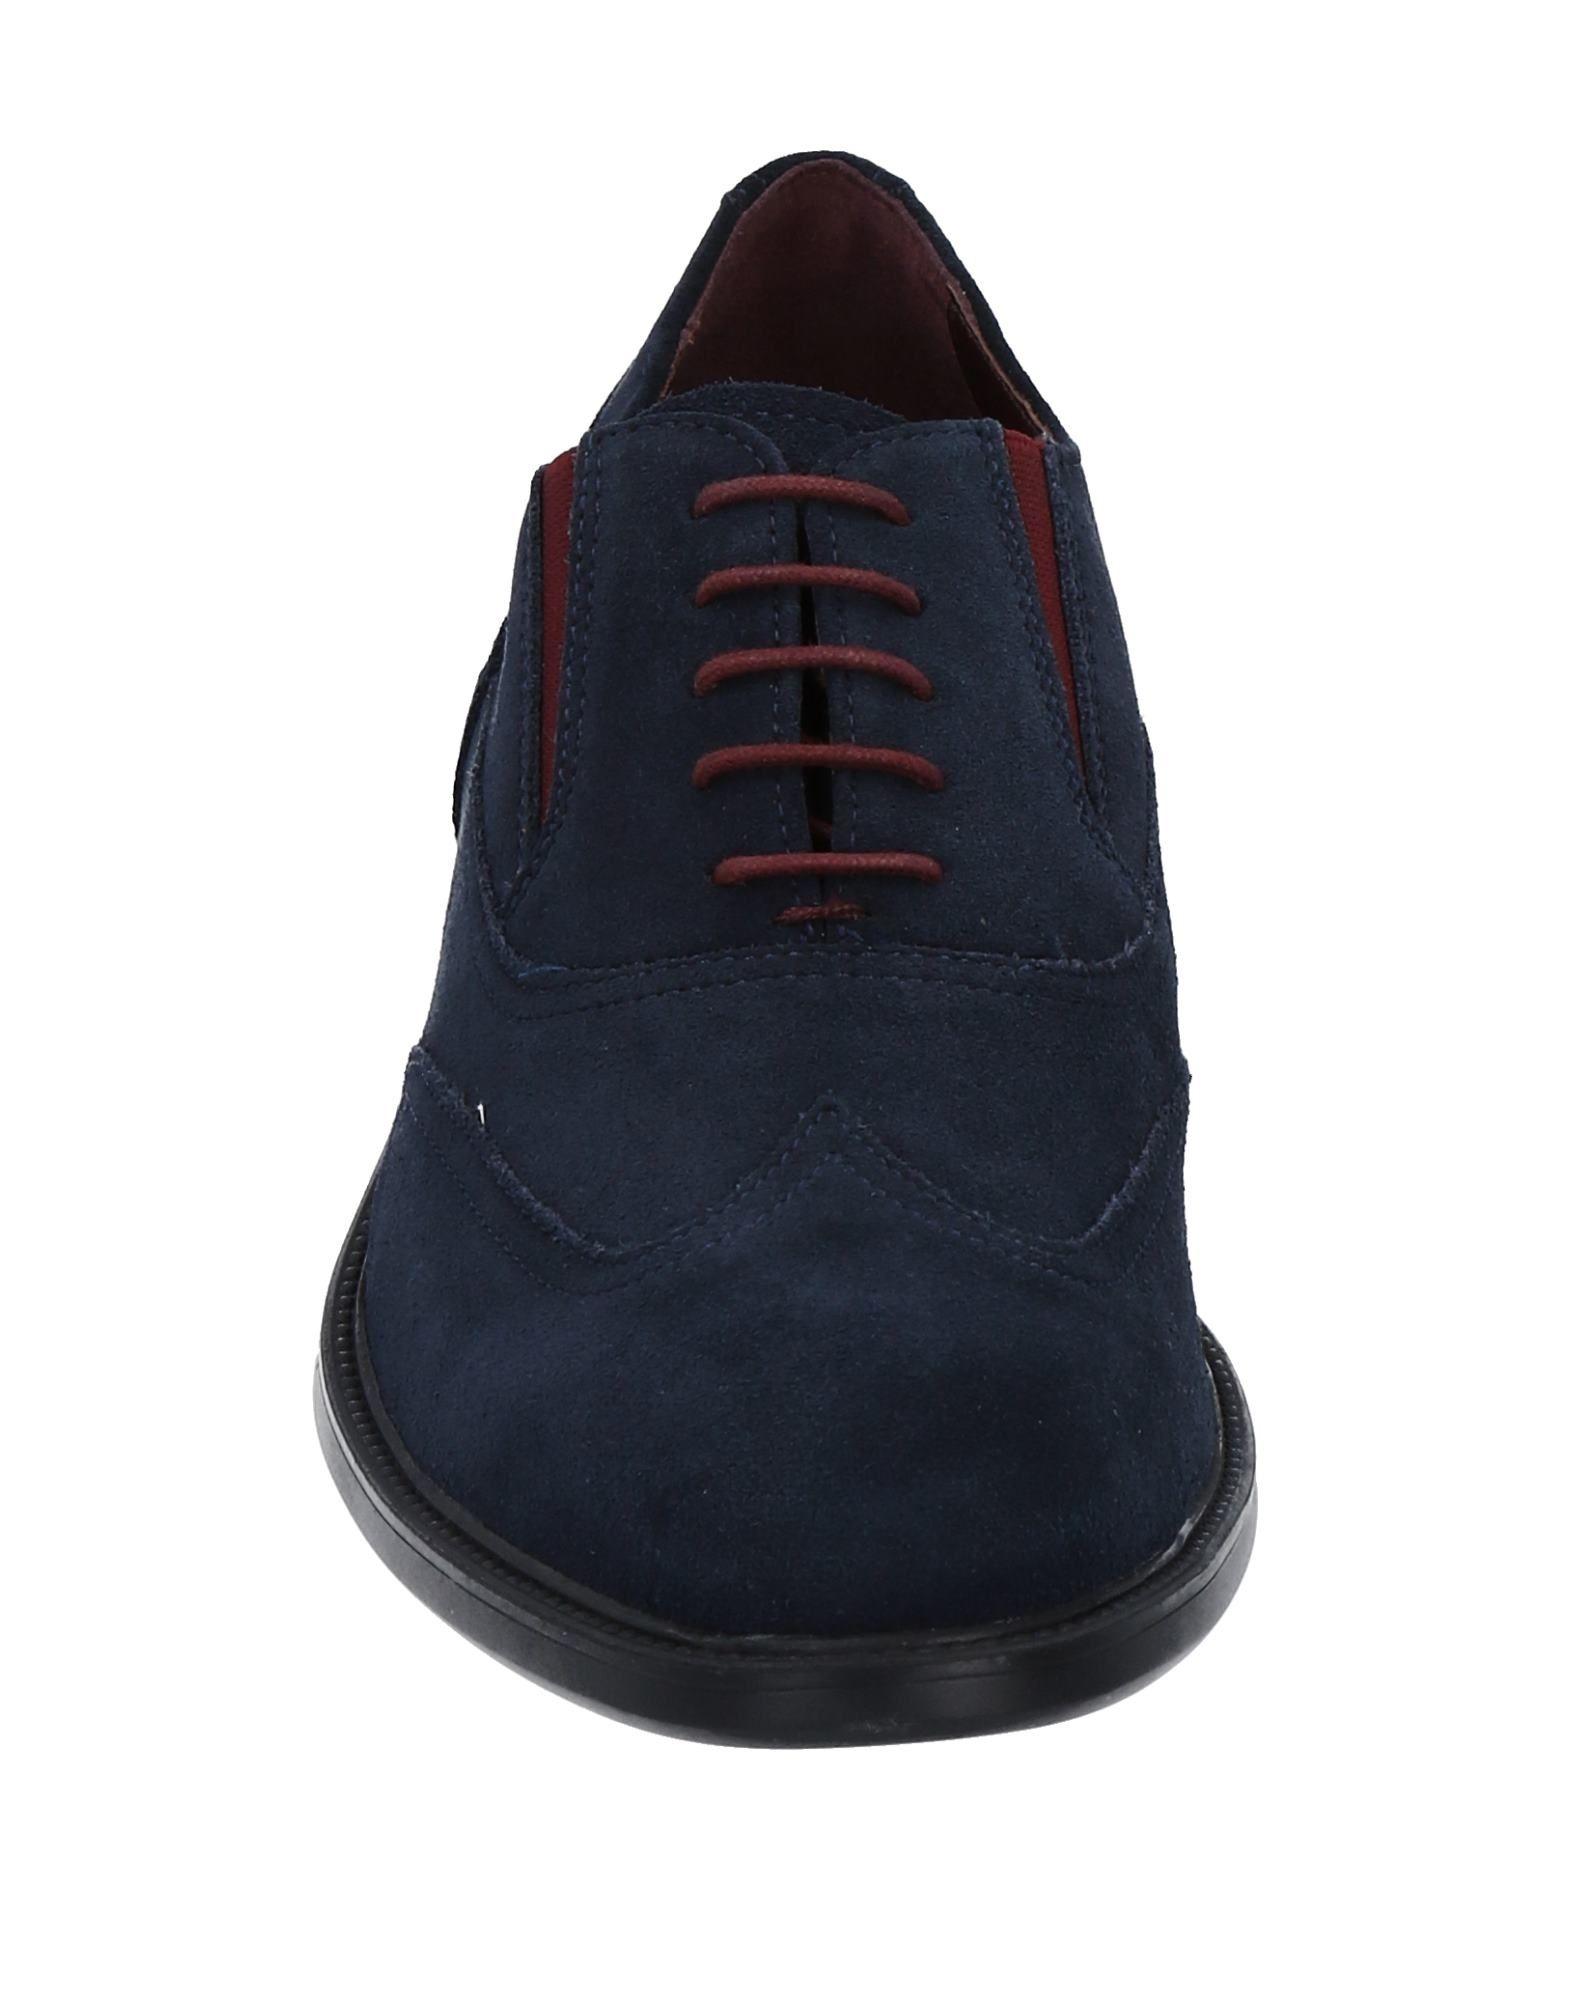 Geox Schnürschuhe 11540923WV Herren  11540923WV Schnürschuhe Heiße Schuhe 97927b